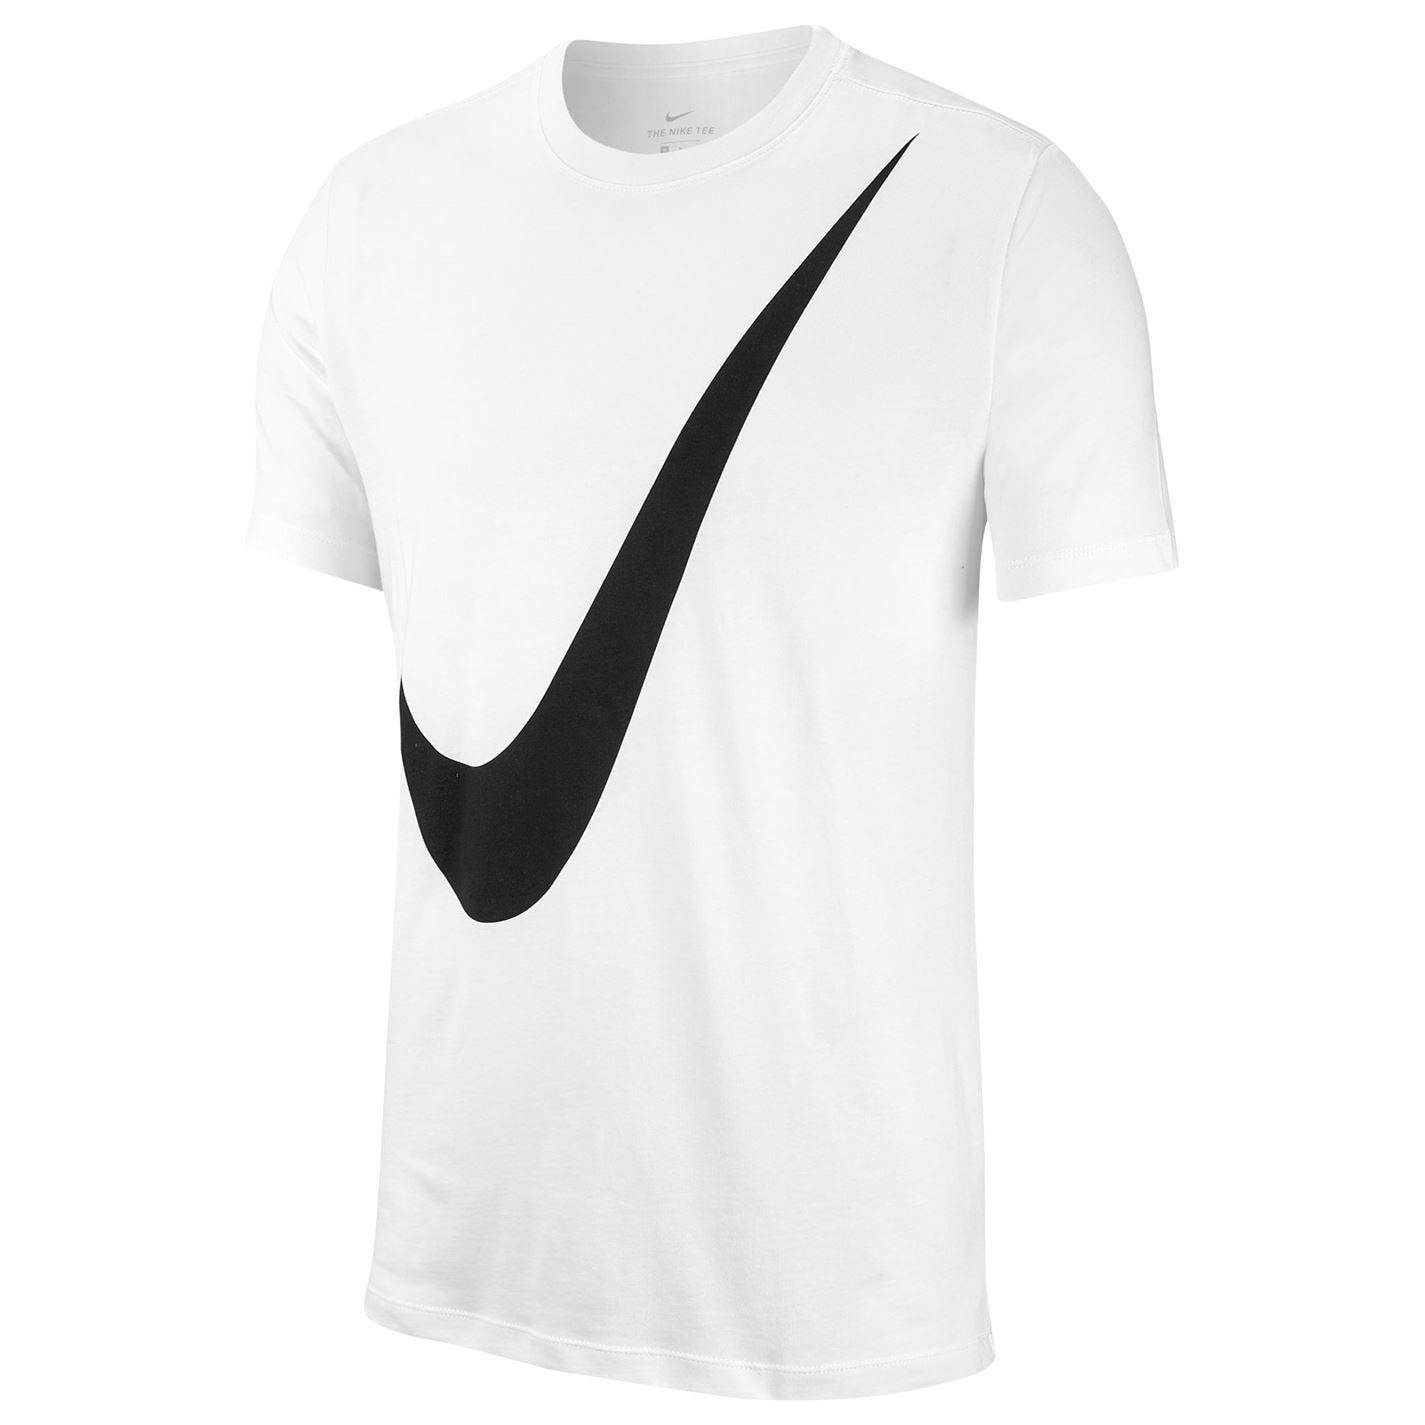 Nike Men/'s Swoosh White Sportswear Short Sleeve Graphic T-Shirt 465649-100 M-XL